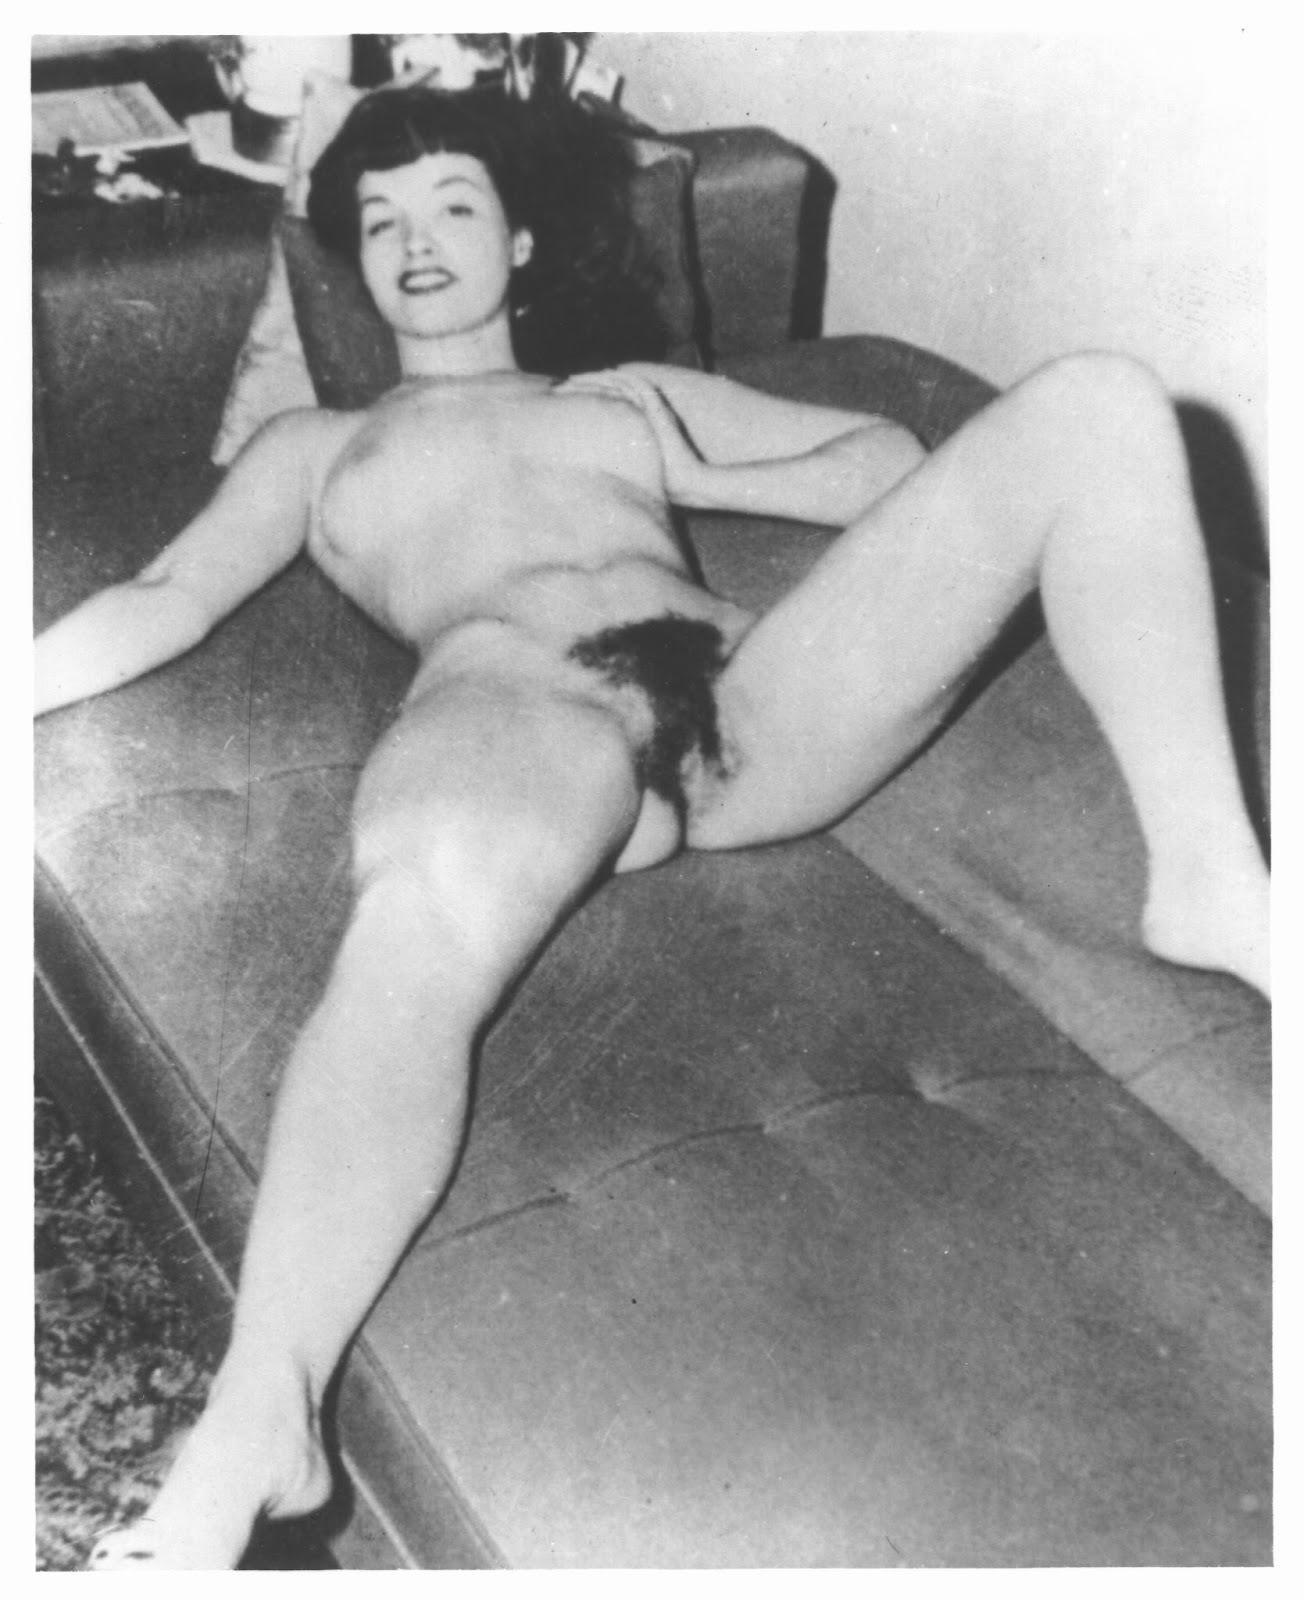 Jeska vardinski anal